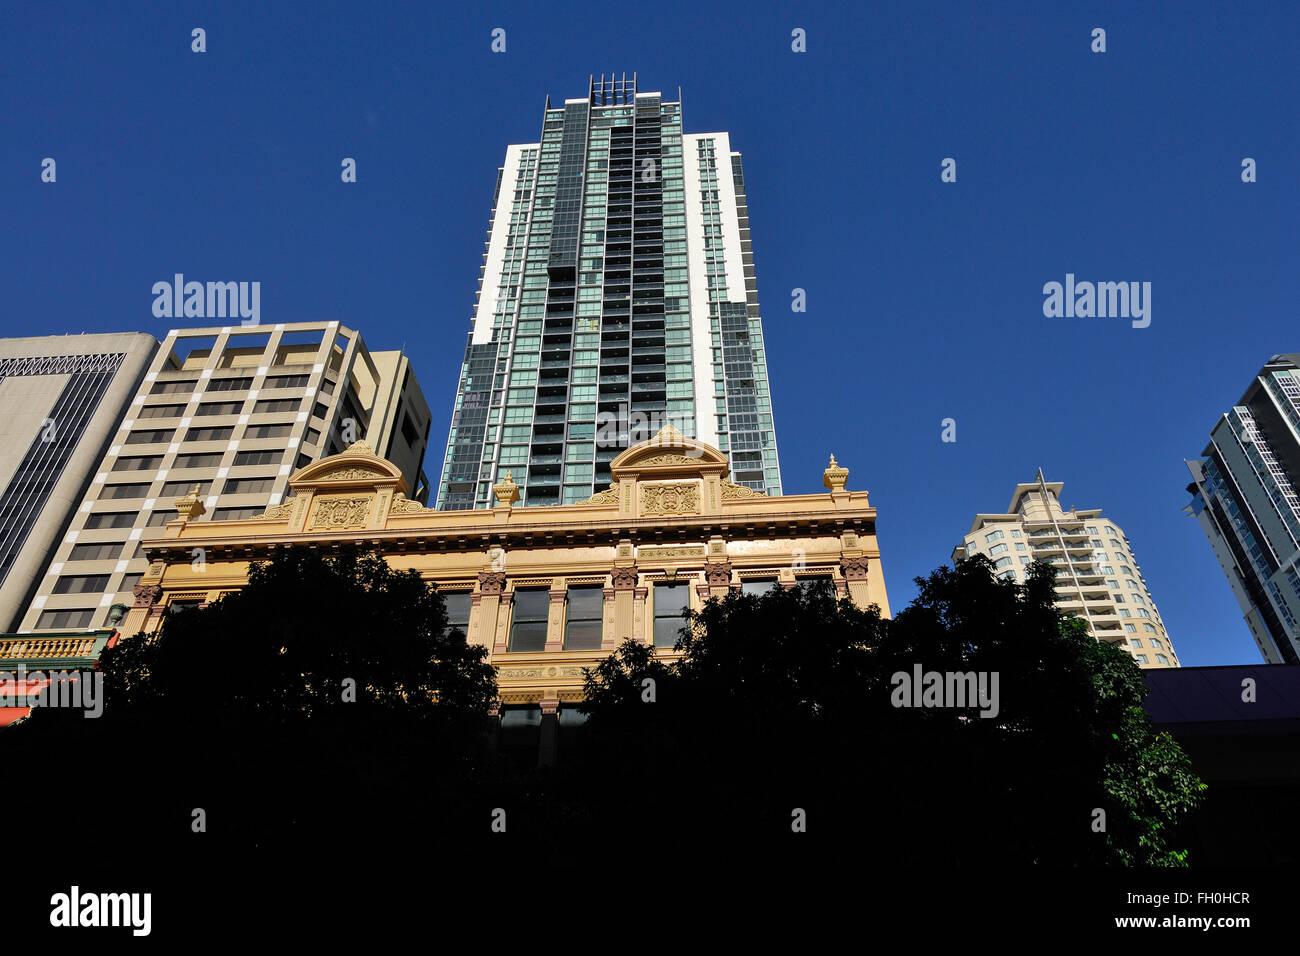 High rise building in Brisbane CBD - Stock Image